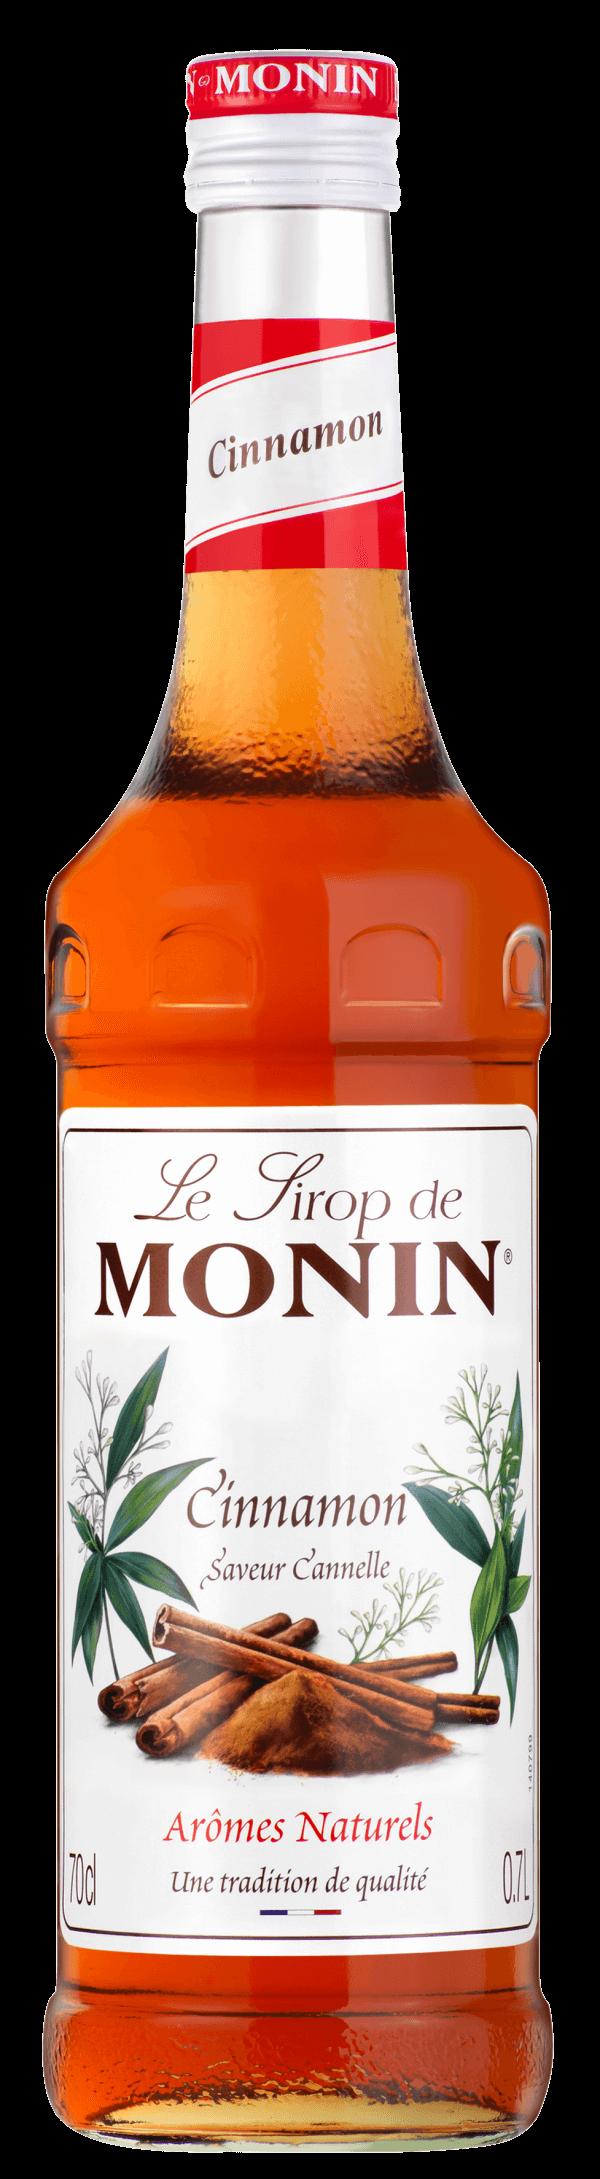 Monin_cinnamon